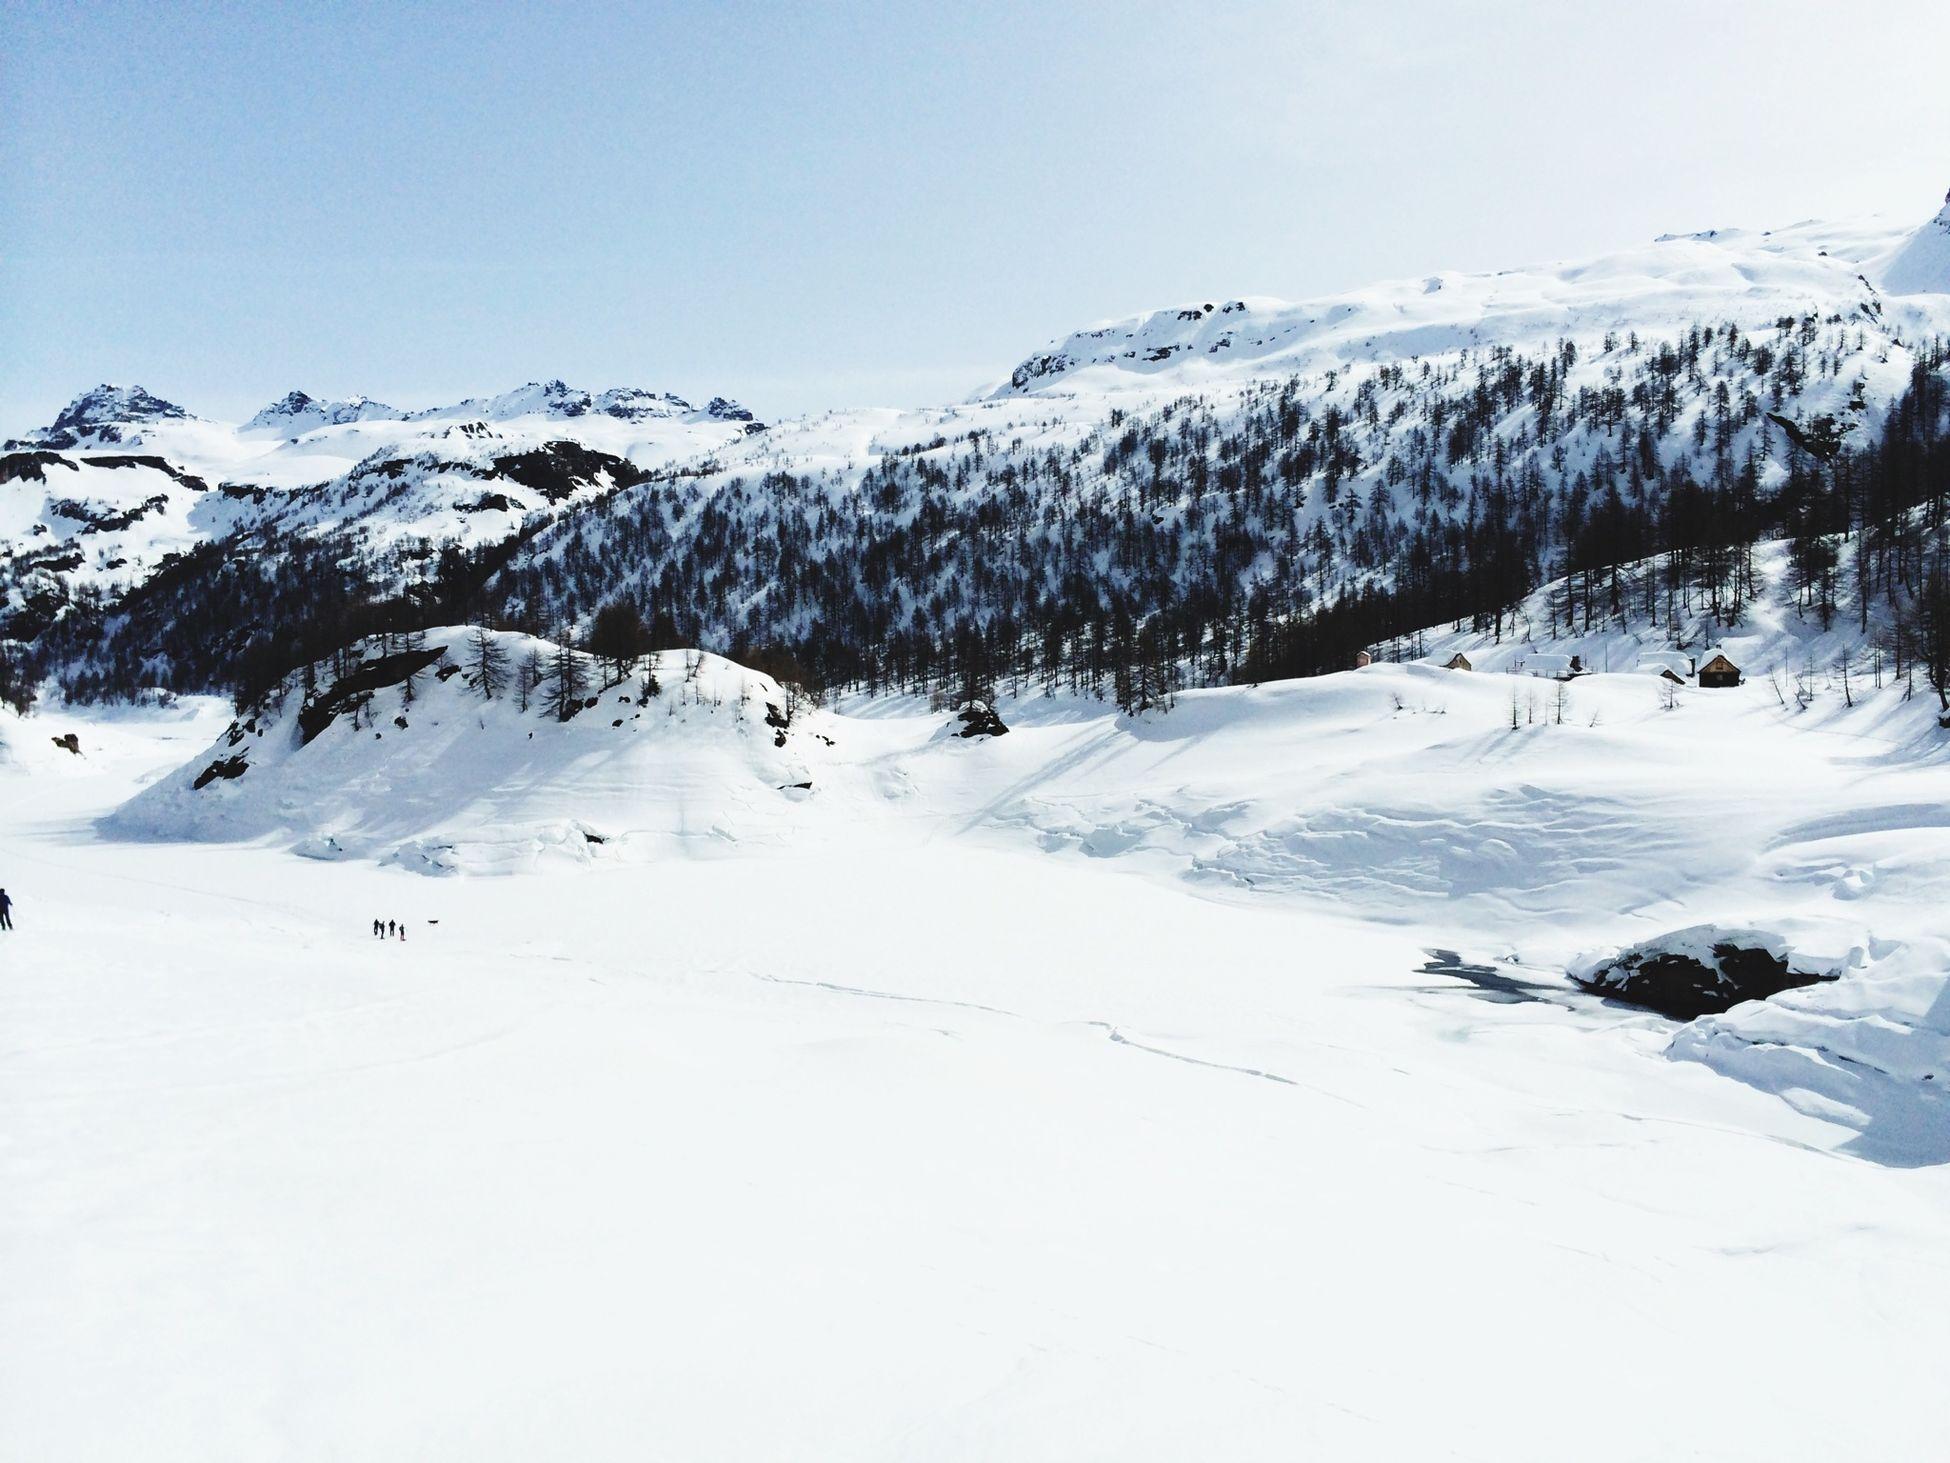 The last Winter Snow